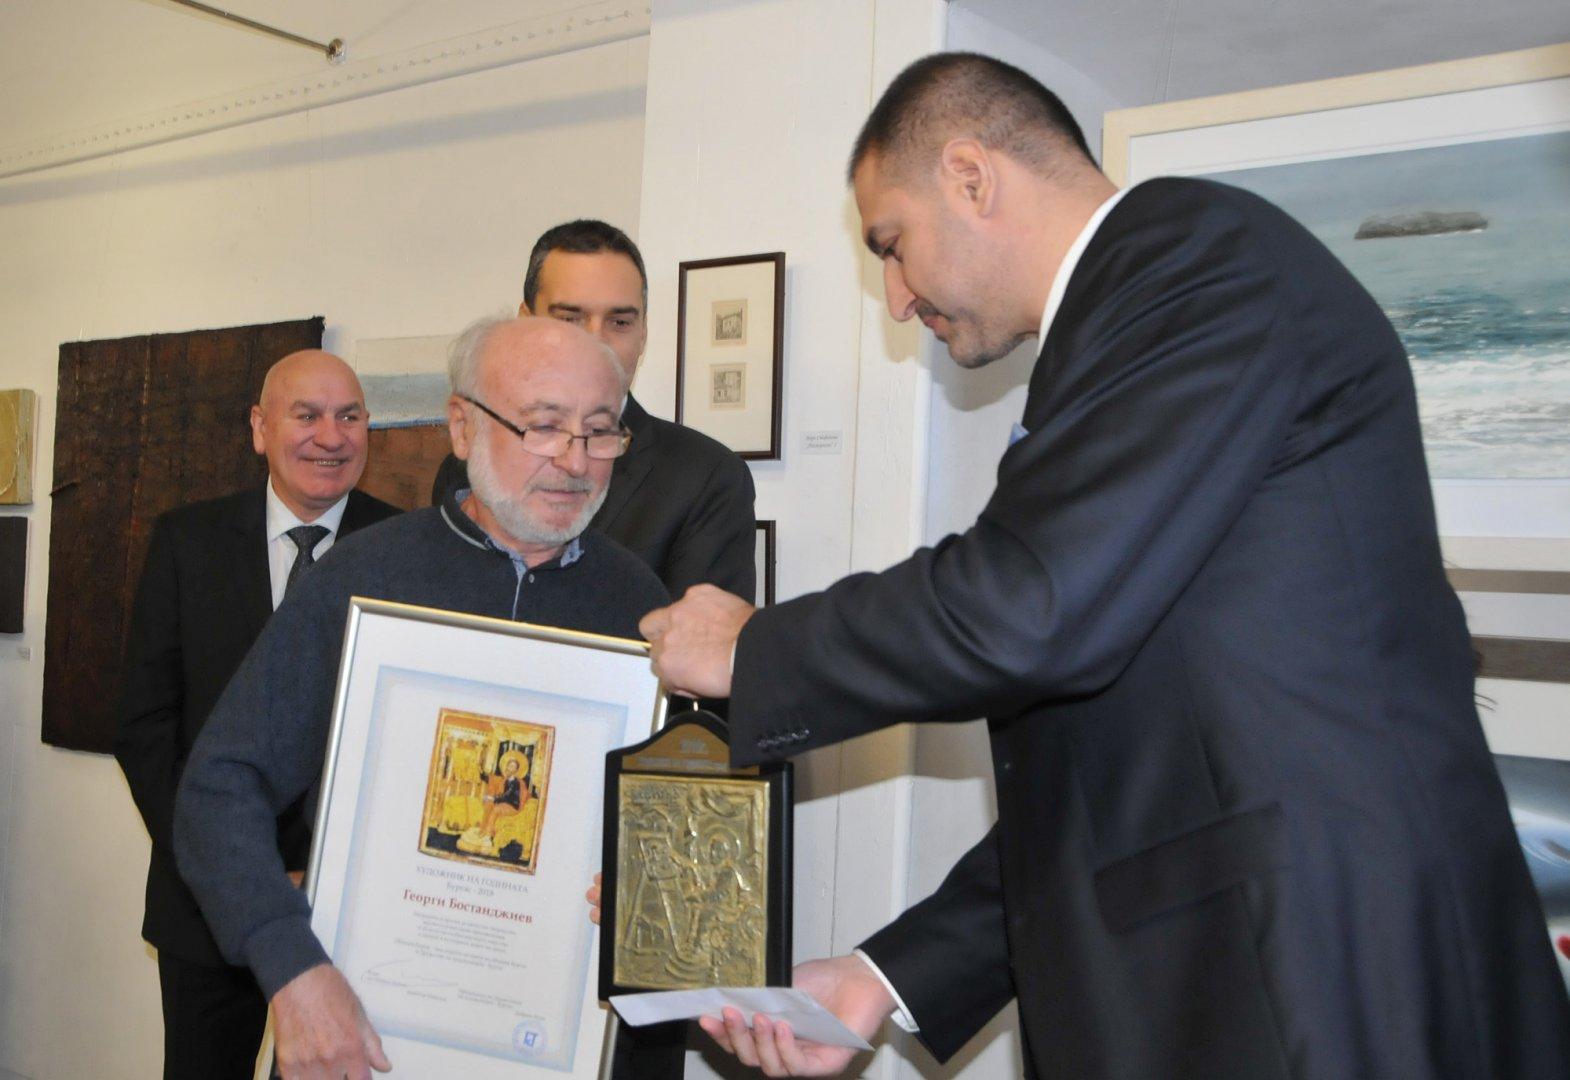 Добрин Вътев (вдясно) връчи наградата на Георги Бостанджиев. Снимки Лина Главинова